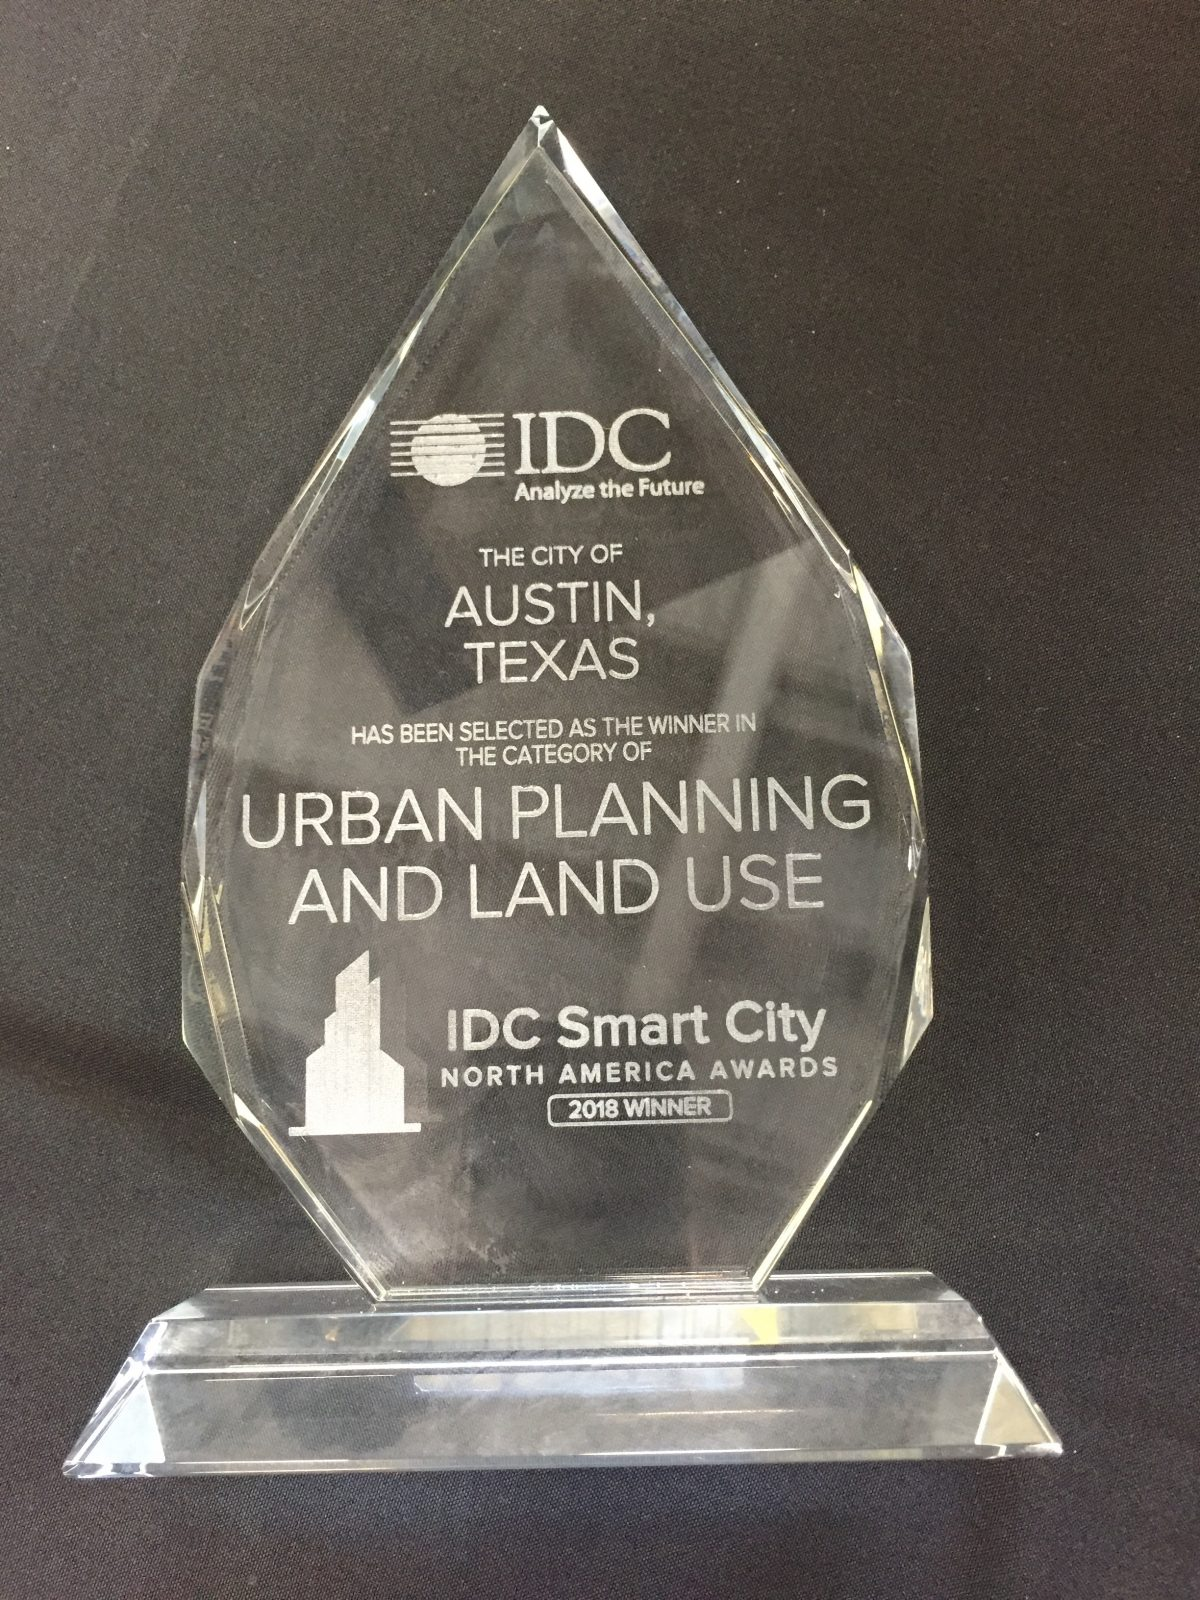 SYNDÉO & Austin, TX Accept 2018 Smart City North America Award